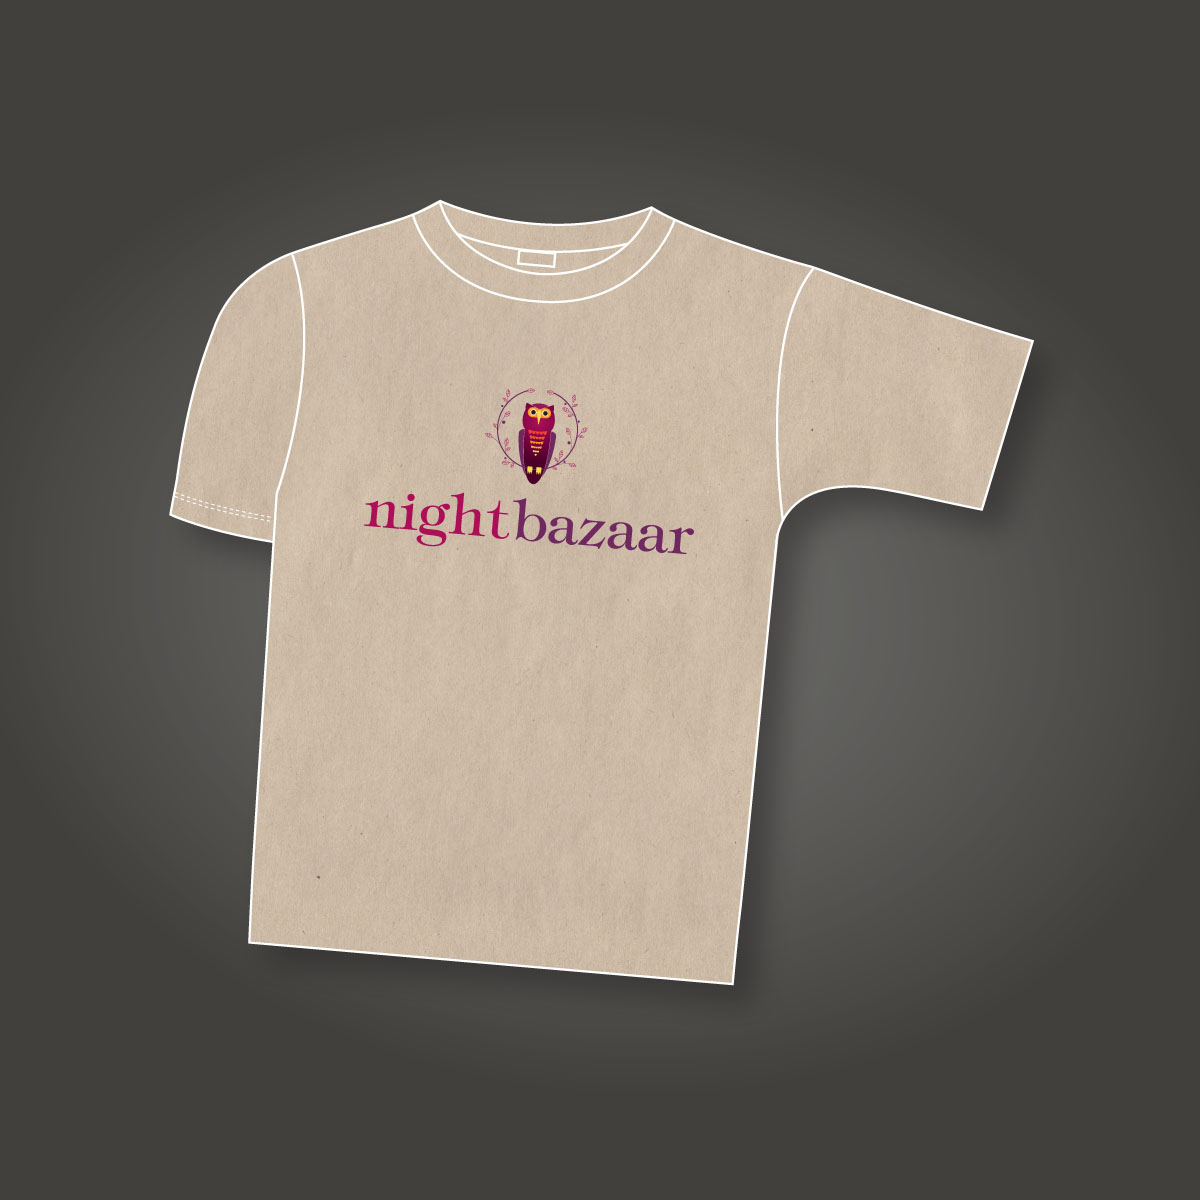 Night Bazaar T-Shirt Design